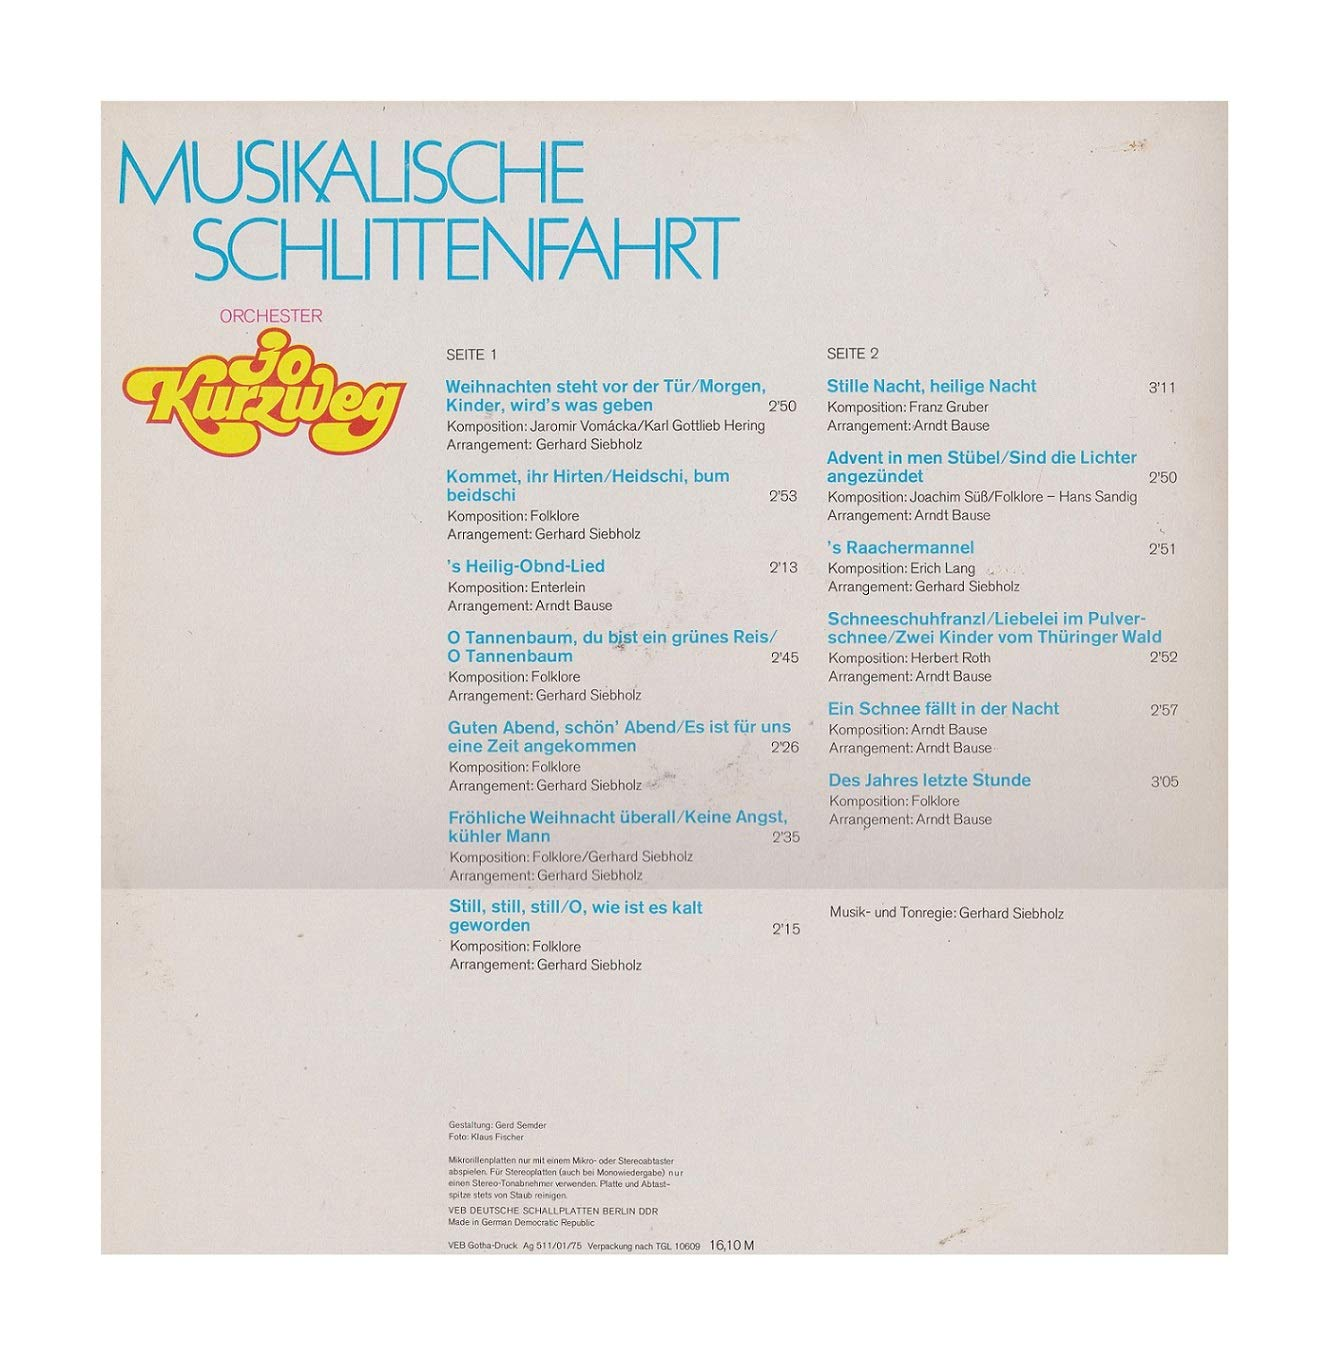 O Tannenbaum Lied Text.Orchester Joachim Kurzweg Orchester Joachim Kurzweg Musikalische